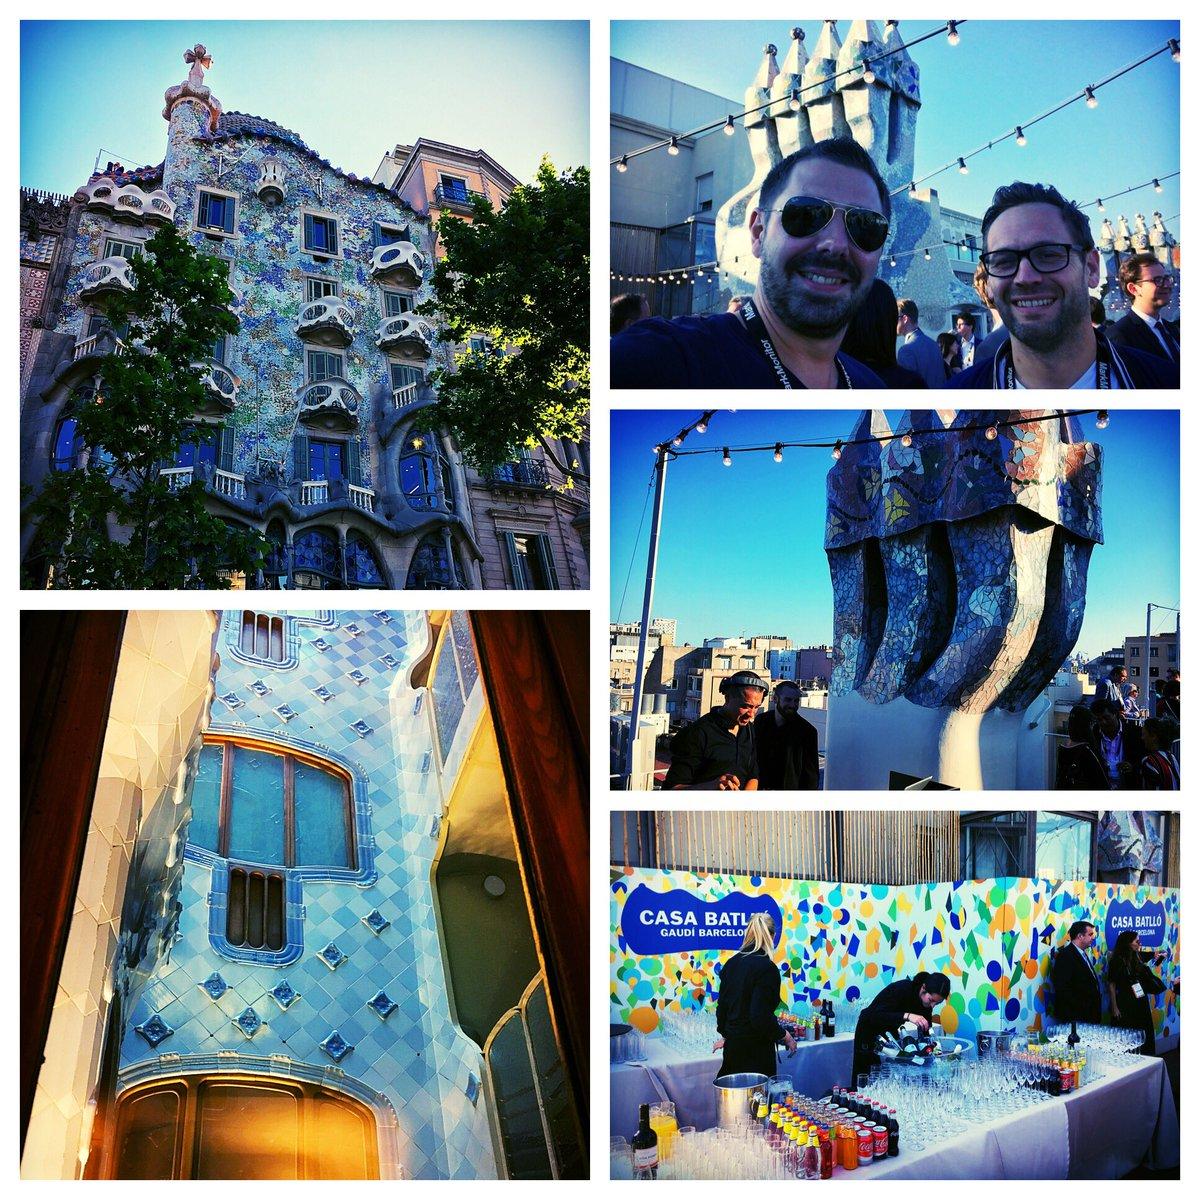 #ThankYou @ISERN_IPTWEETS for the classy event #Inta17 in the @CasaBatlloGaudi - #MuchasGracias #Merci #OKLM<br>http://pic.twitter.com/P9j6Gd5iBF